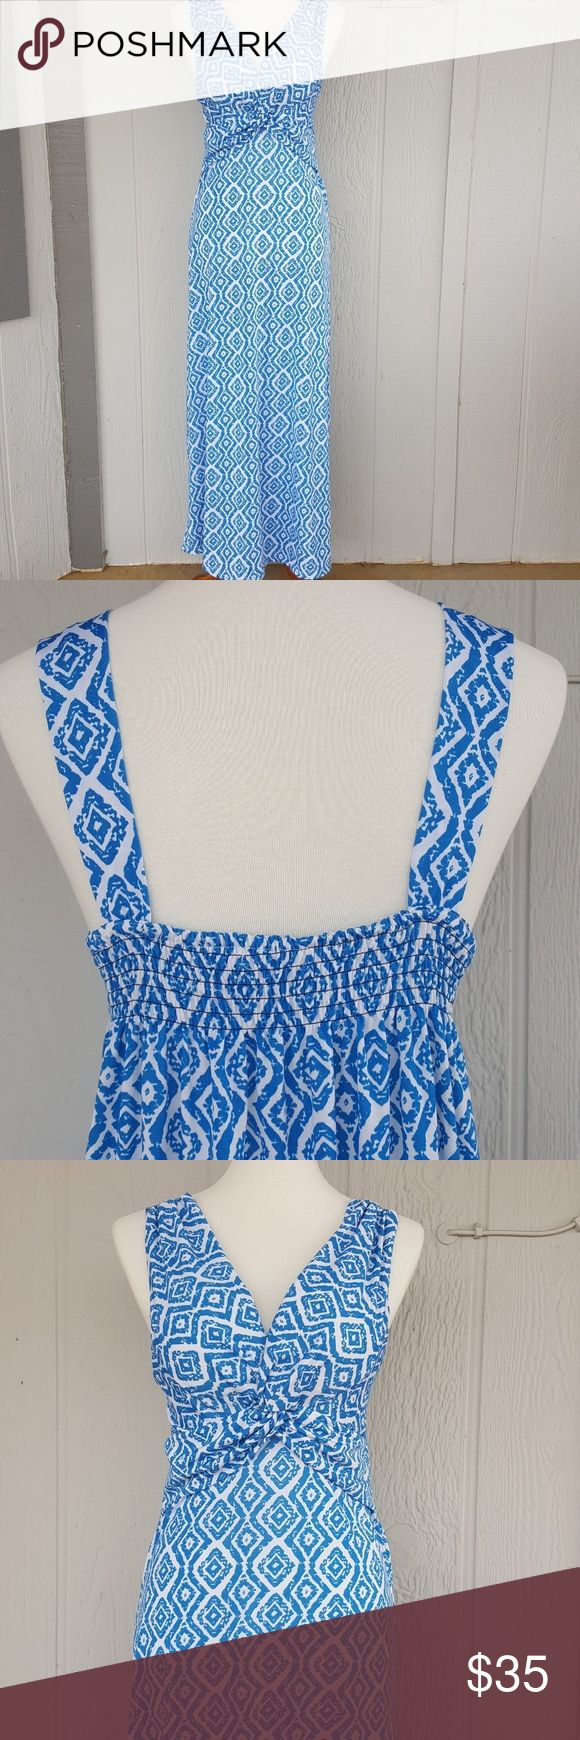 Blue and White Maxi Wrap Dress Sleeveless long dress with blue and white squares pattern. Dresses Maxi